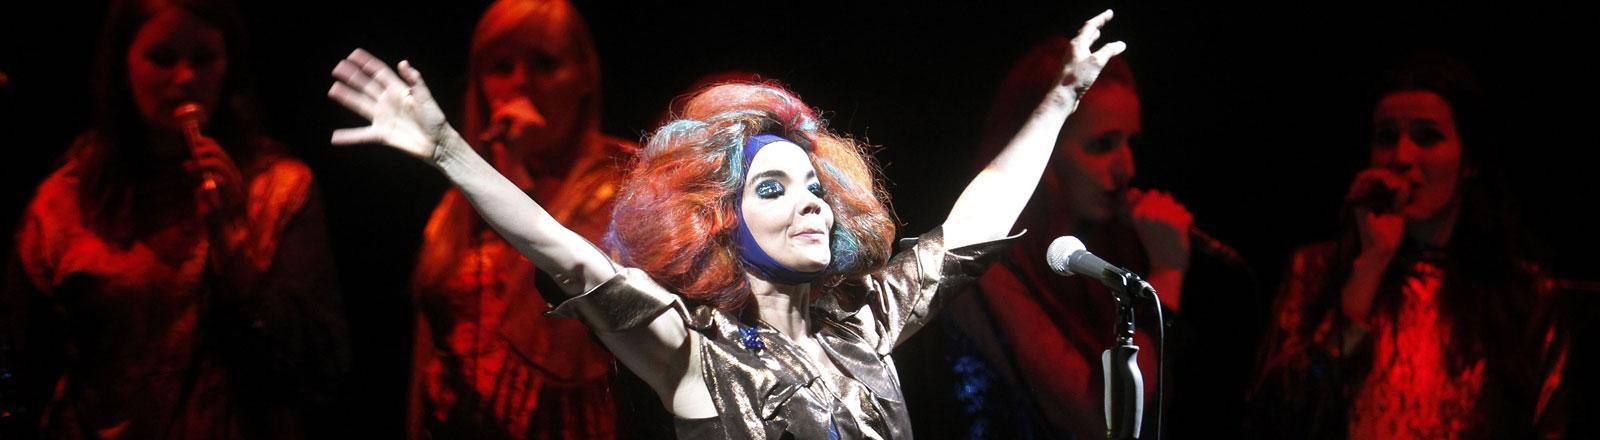 Björk beim Lollapalooza Music Festival in Santiago de Chile.